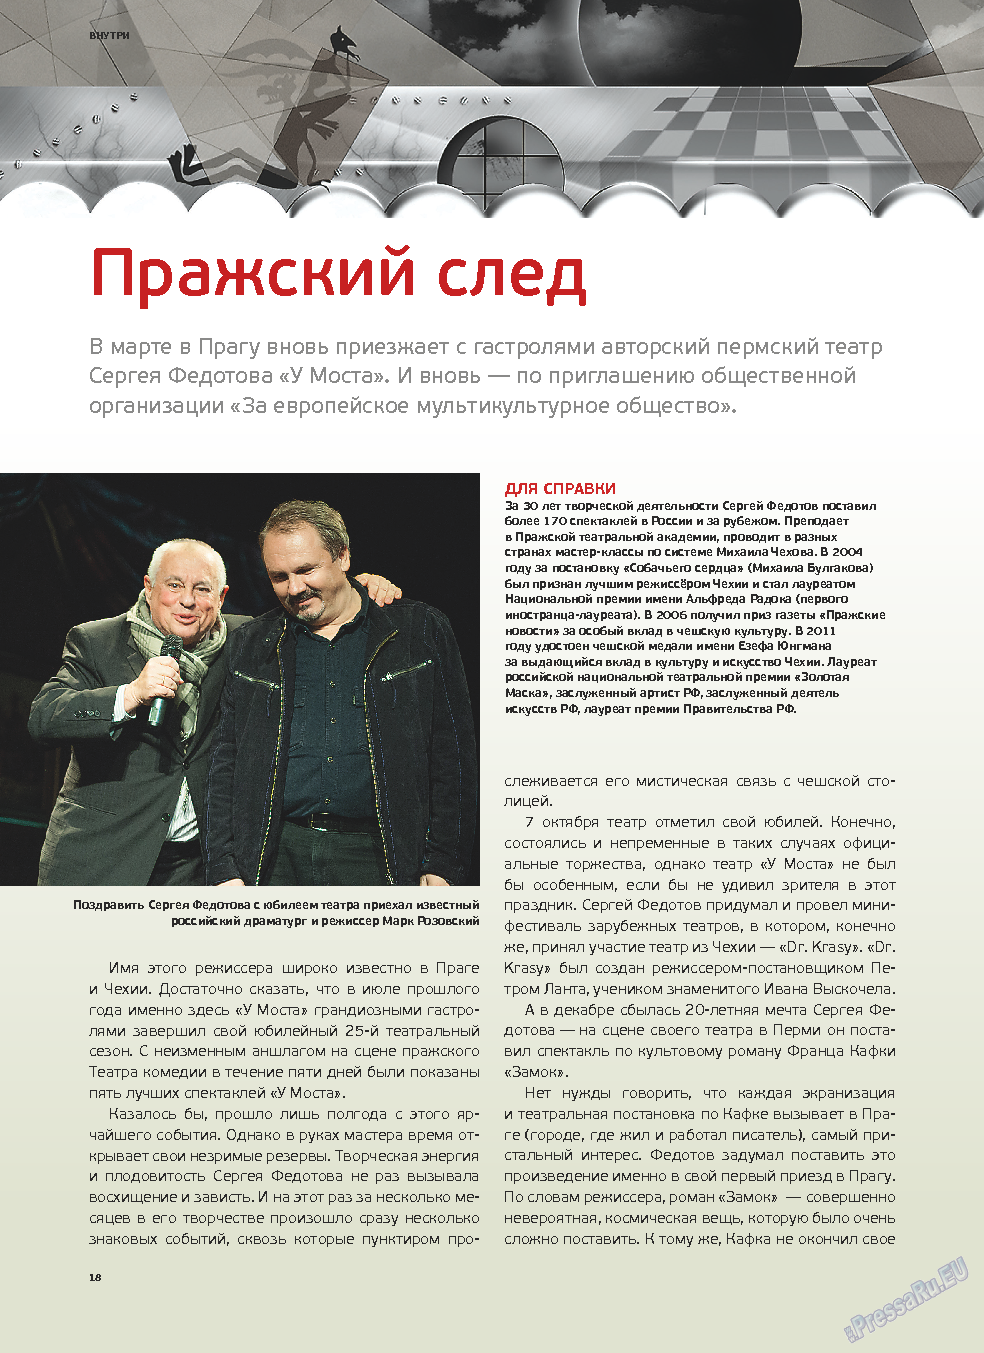 Артек (журнал). 2013 год, номер 6, стр. 20